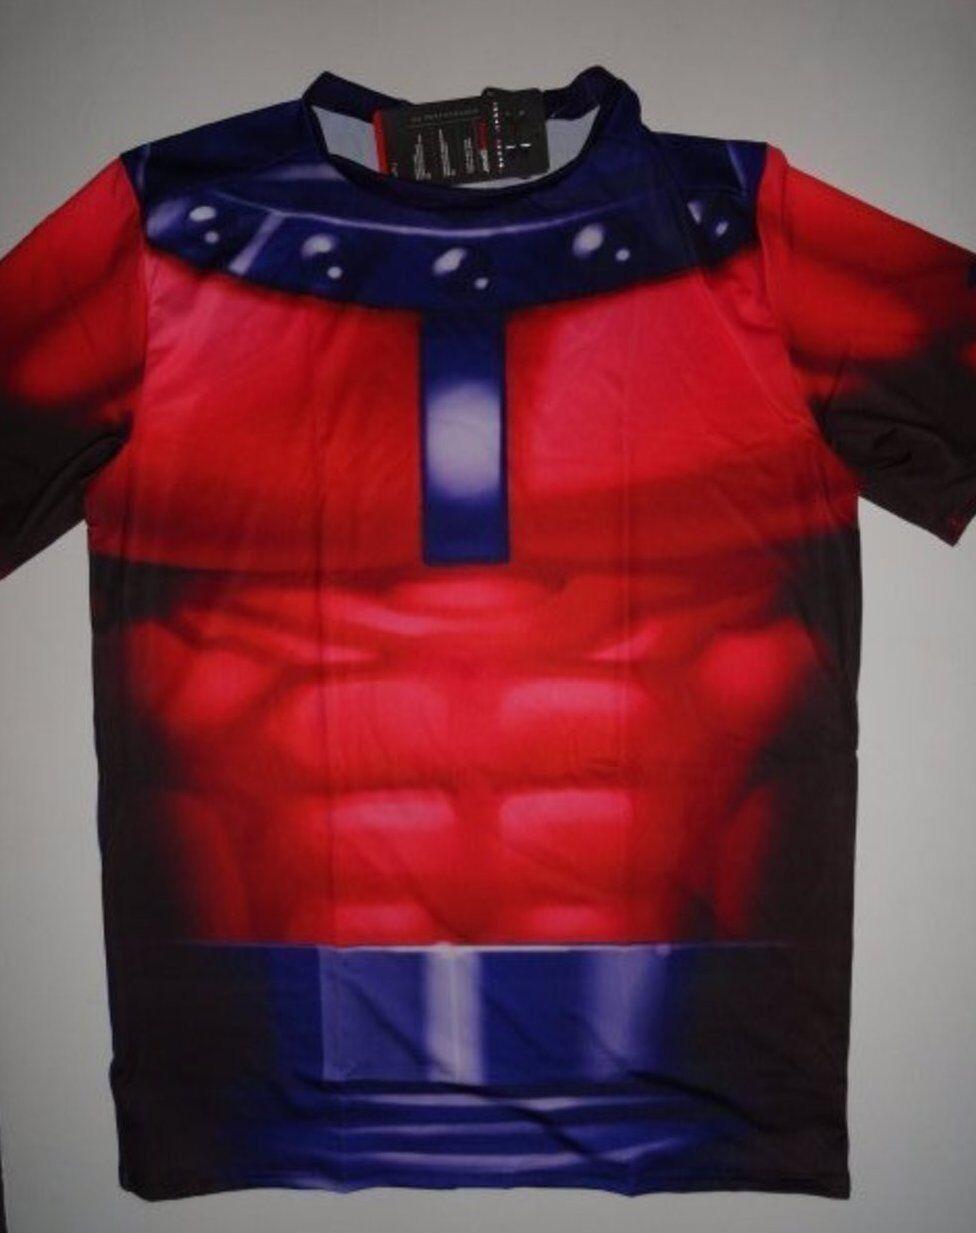 NWT Under Armour X-Uomo X-Uomo Armour Magneto Uomo's 3XL XXXL Compression Alter Ego T-shirt 571bfc